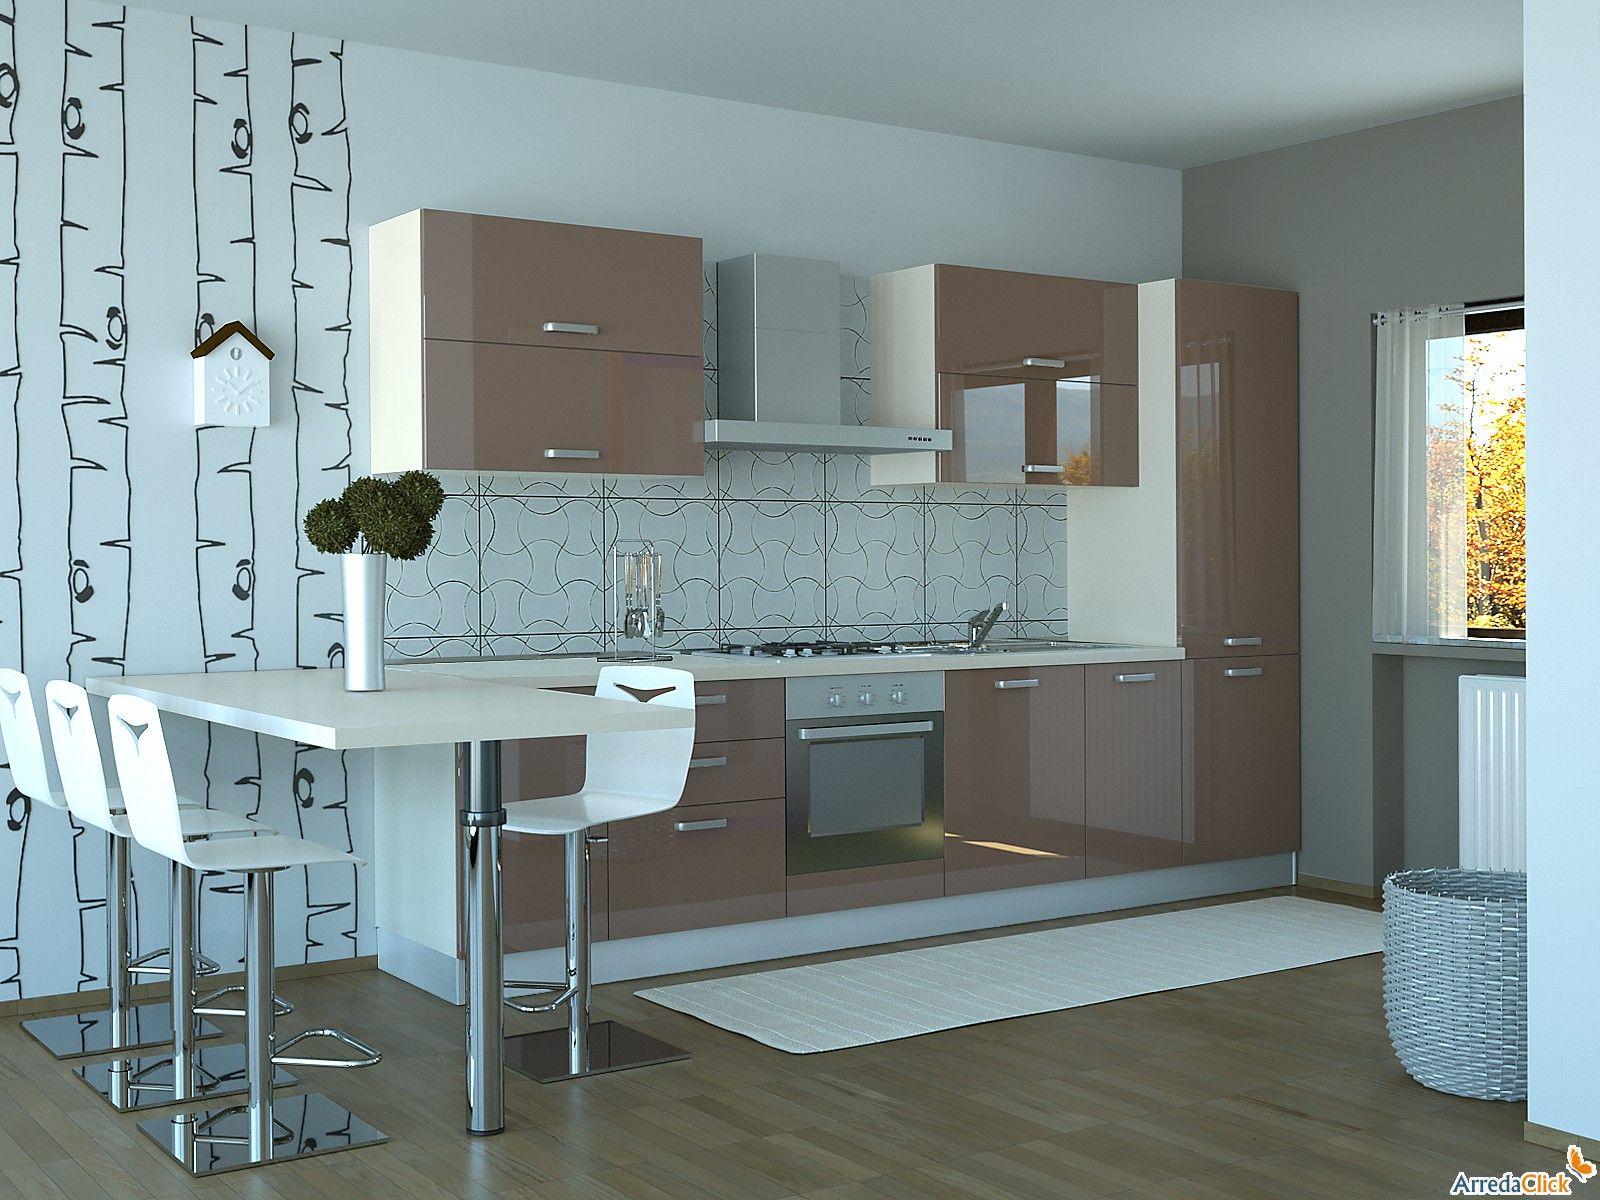 Progettazione Cucina - Progettazione 3D - ARREDACLICK | Idee per la ...